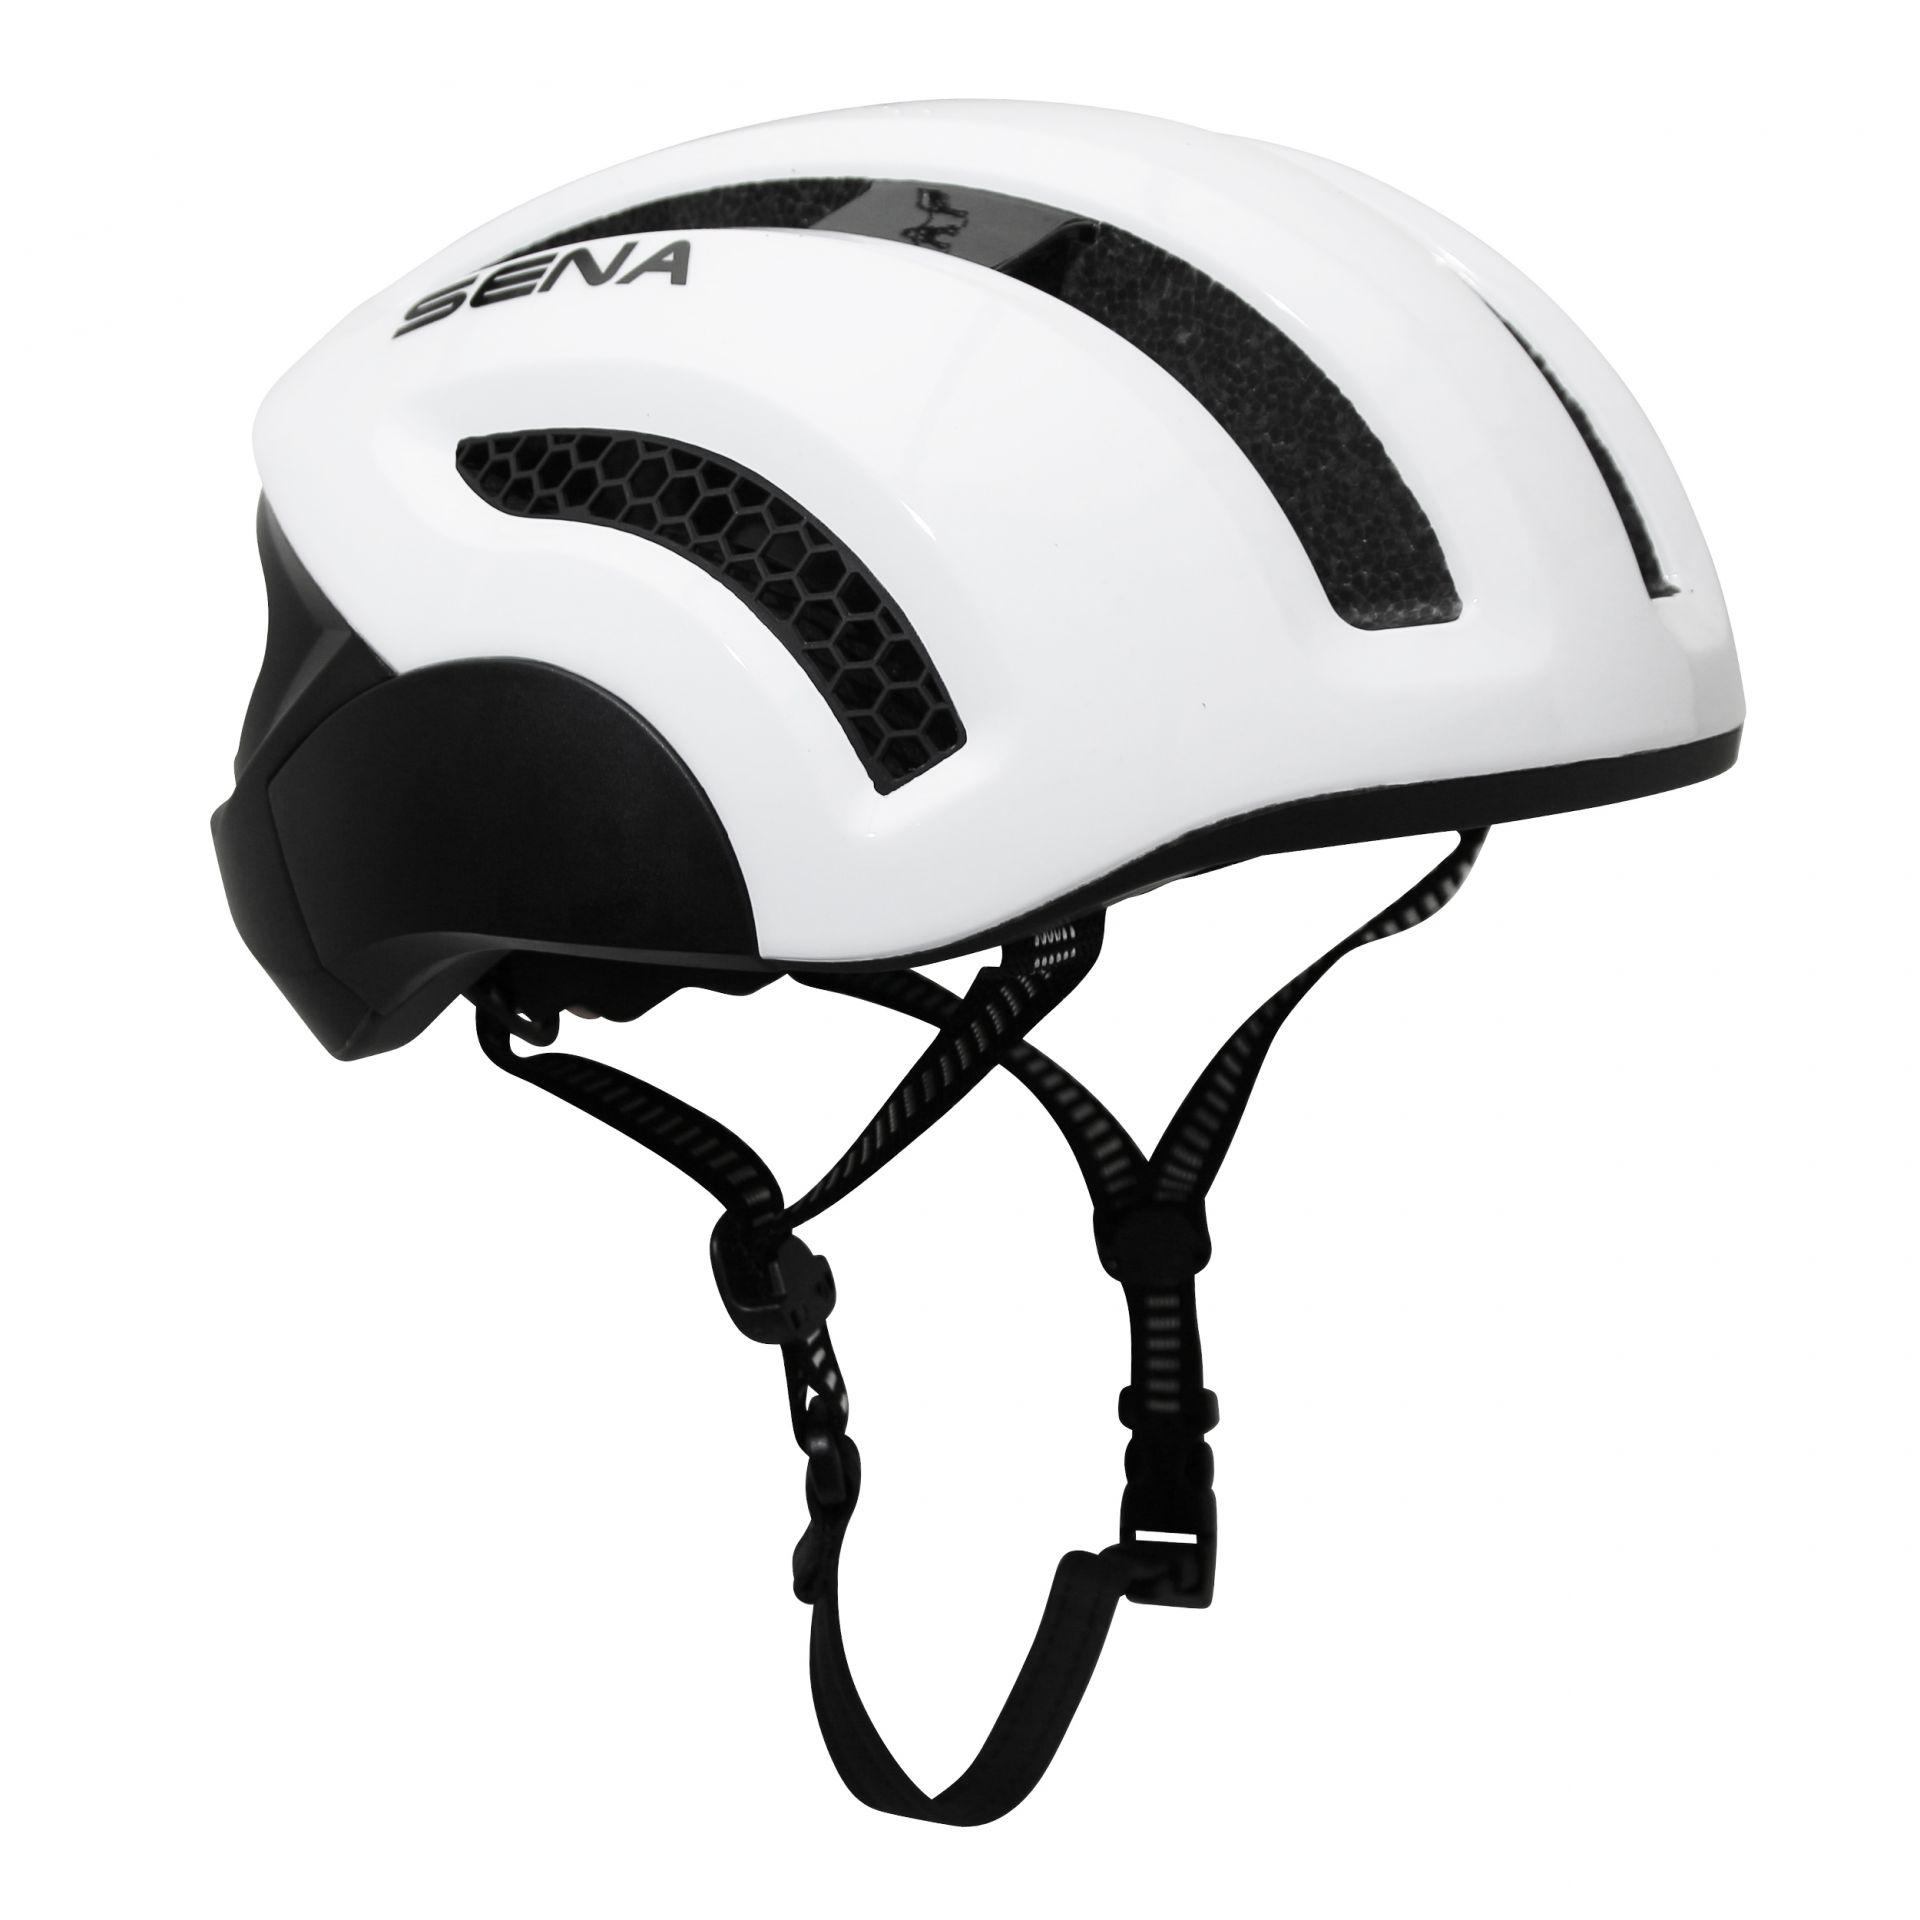 Casque vélo Sena X1 In-Mold Connection Bluetooth 4.1 Avec kit main-libre Blanc - M (55-59 cm)